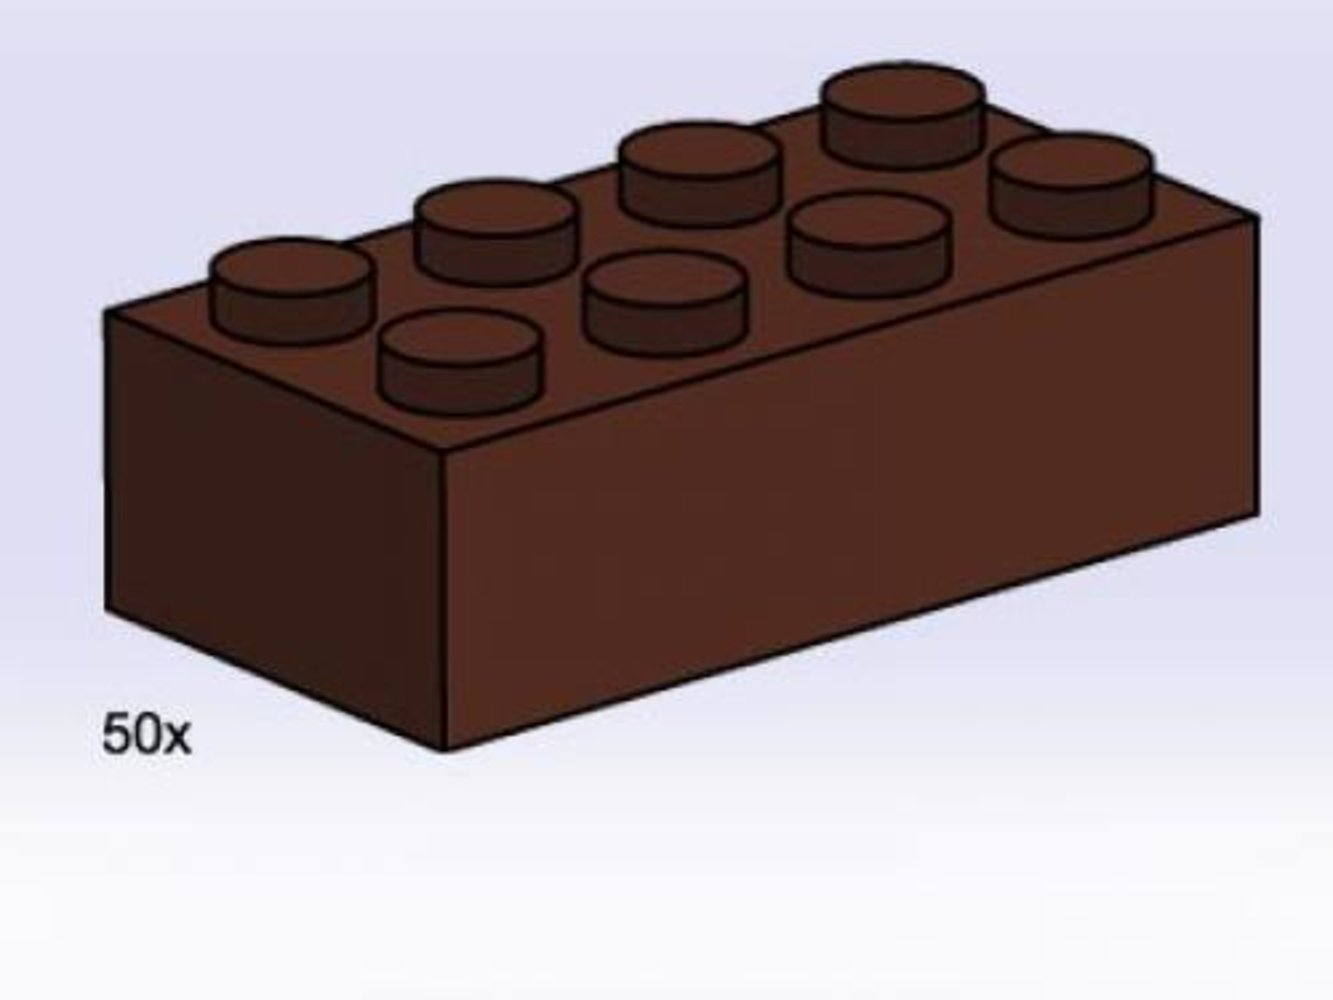 2 x 4 Brown Bricks